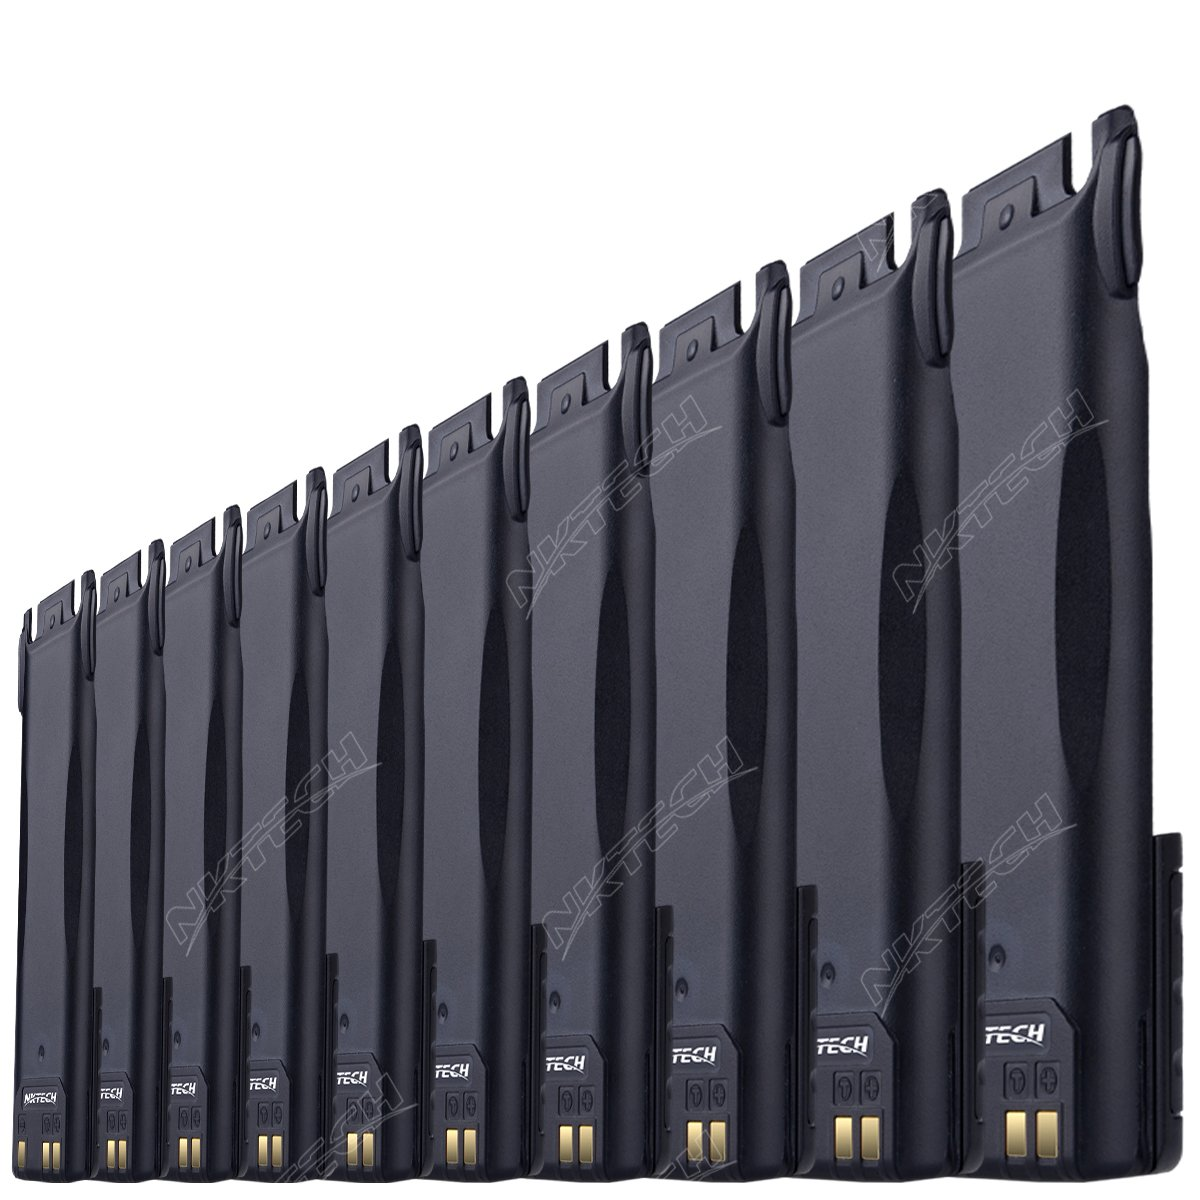 10-Pcs NKTECH BL-8 4200mAh Extended 7.4V Li-ion Battery For BaoFeng Pofung UV-82 UV-82HP UV-82C UV-82L UV-82X Ham Two Way Radio Transceiver Batteries Accessories Warranty